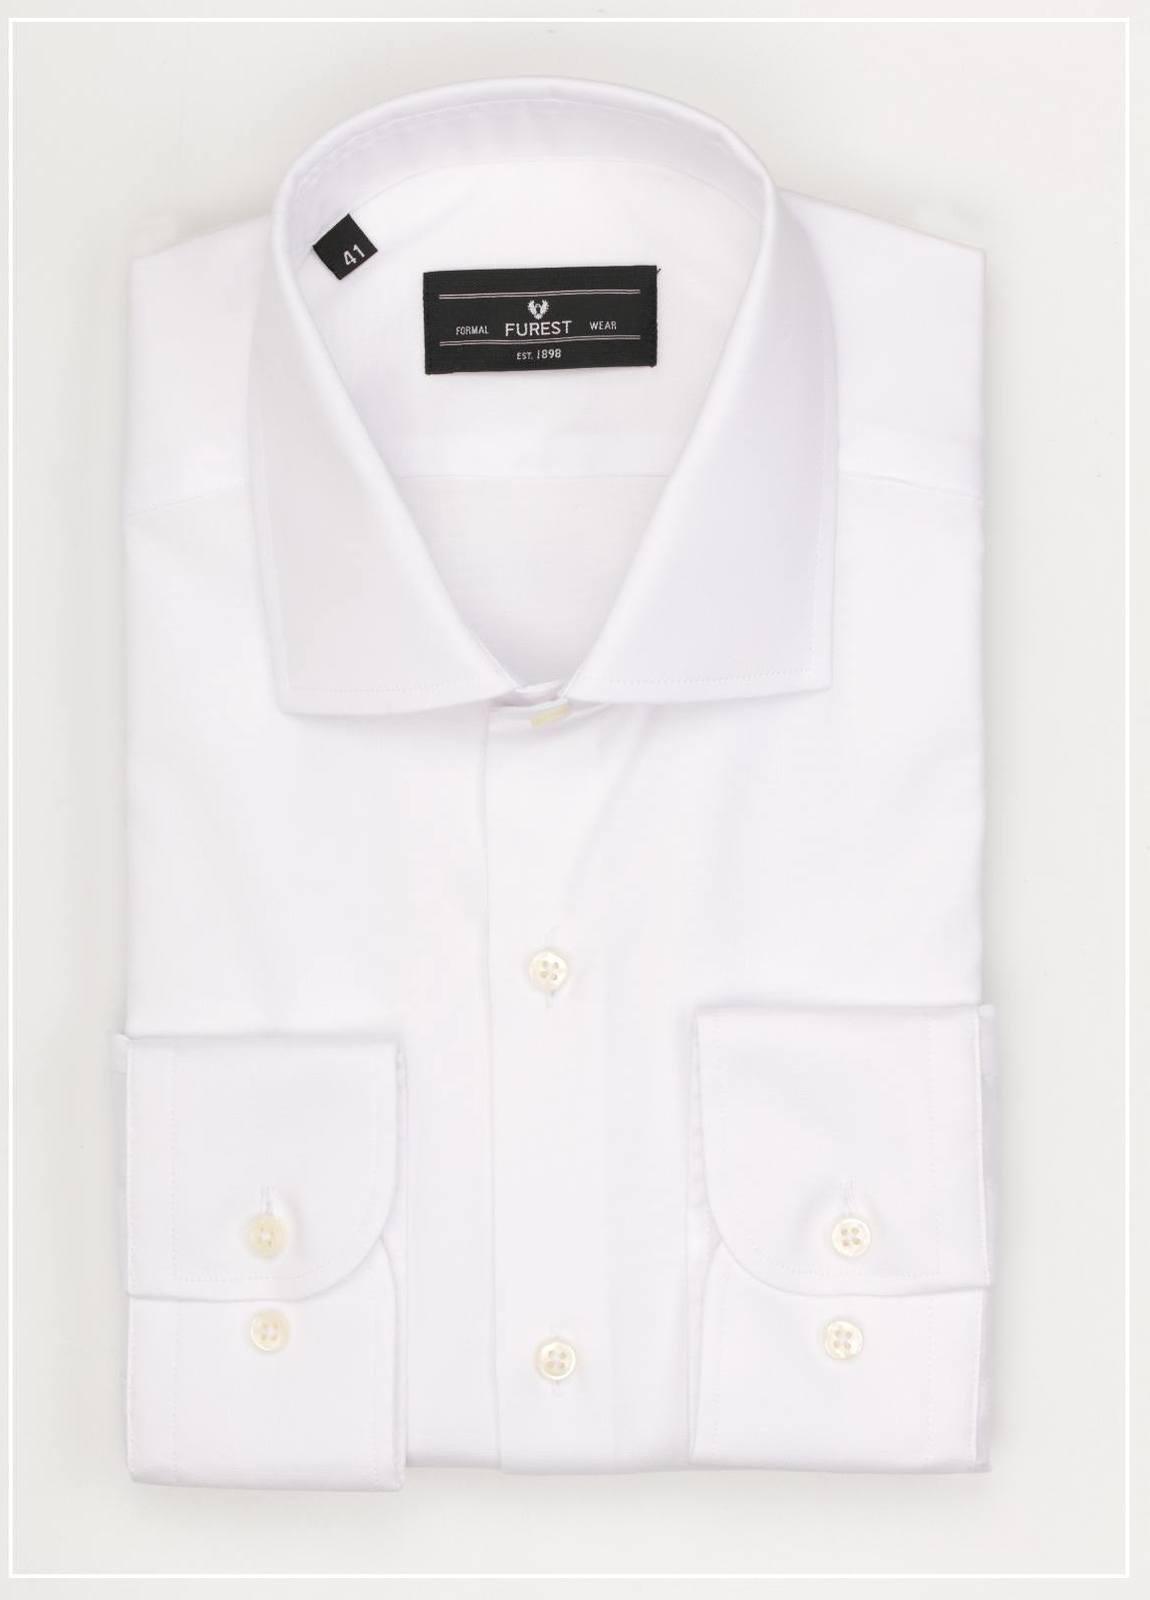 Camisa Formal Wear REGULAR FIT cuello italiano modelo TAILORED NAPOLI tejido color blanco, 100% Algodón.